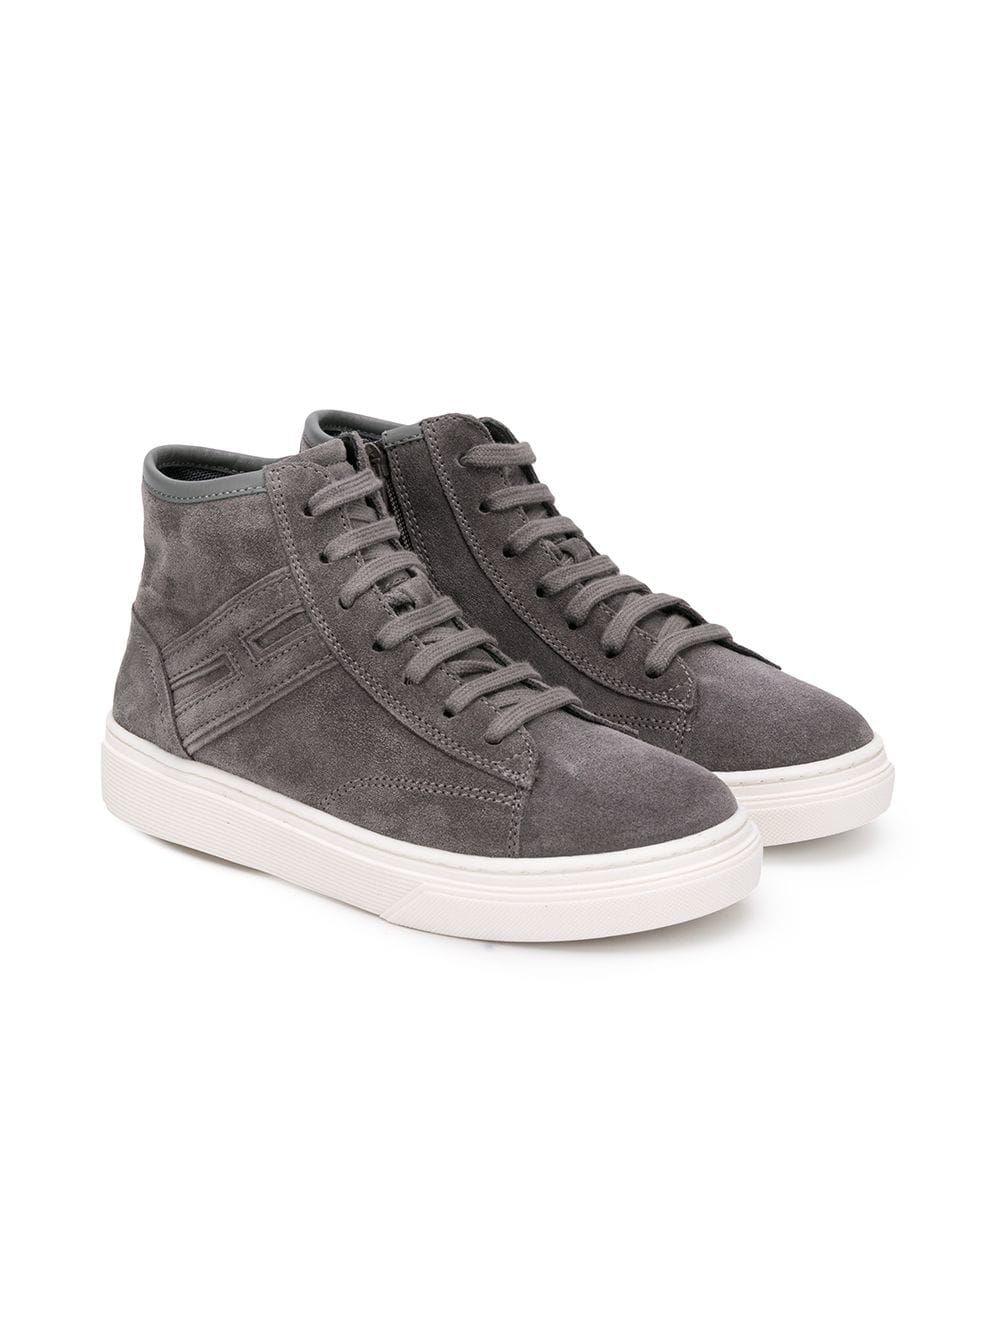 c5889e7cf8d0d Shop online for Hogan Kids J340 sneakers - Grey by Hogan Kids   Buy Hogan  Kids